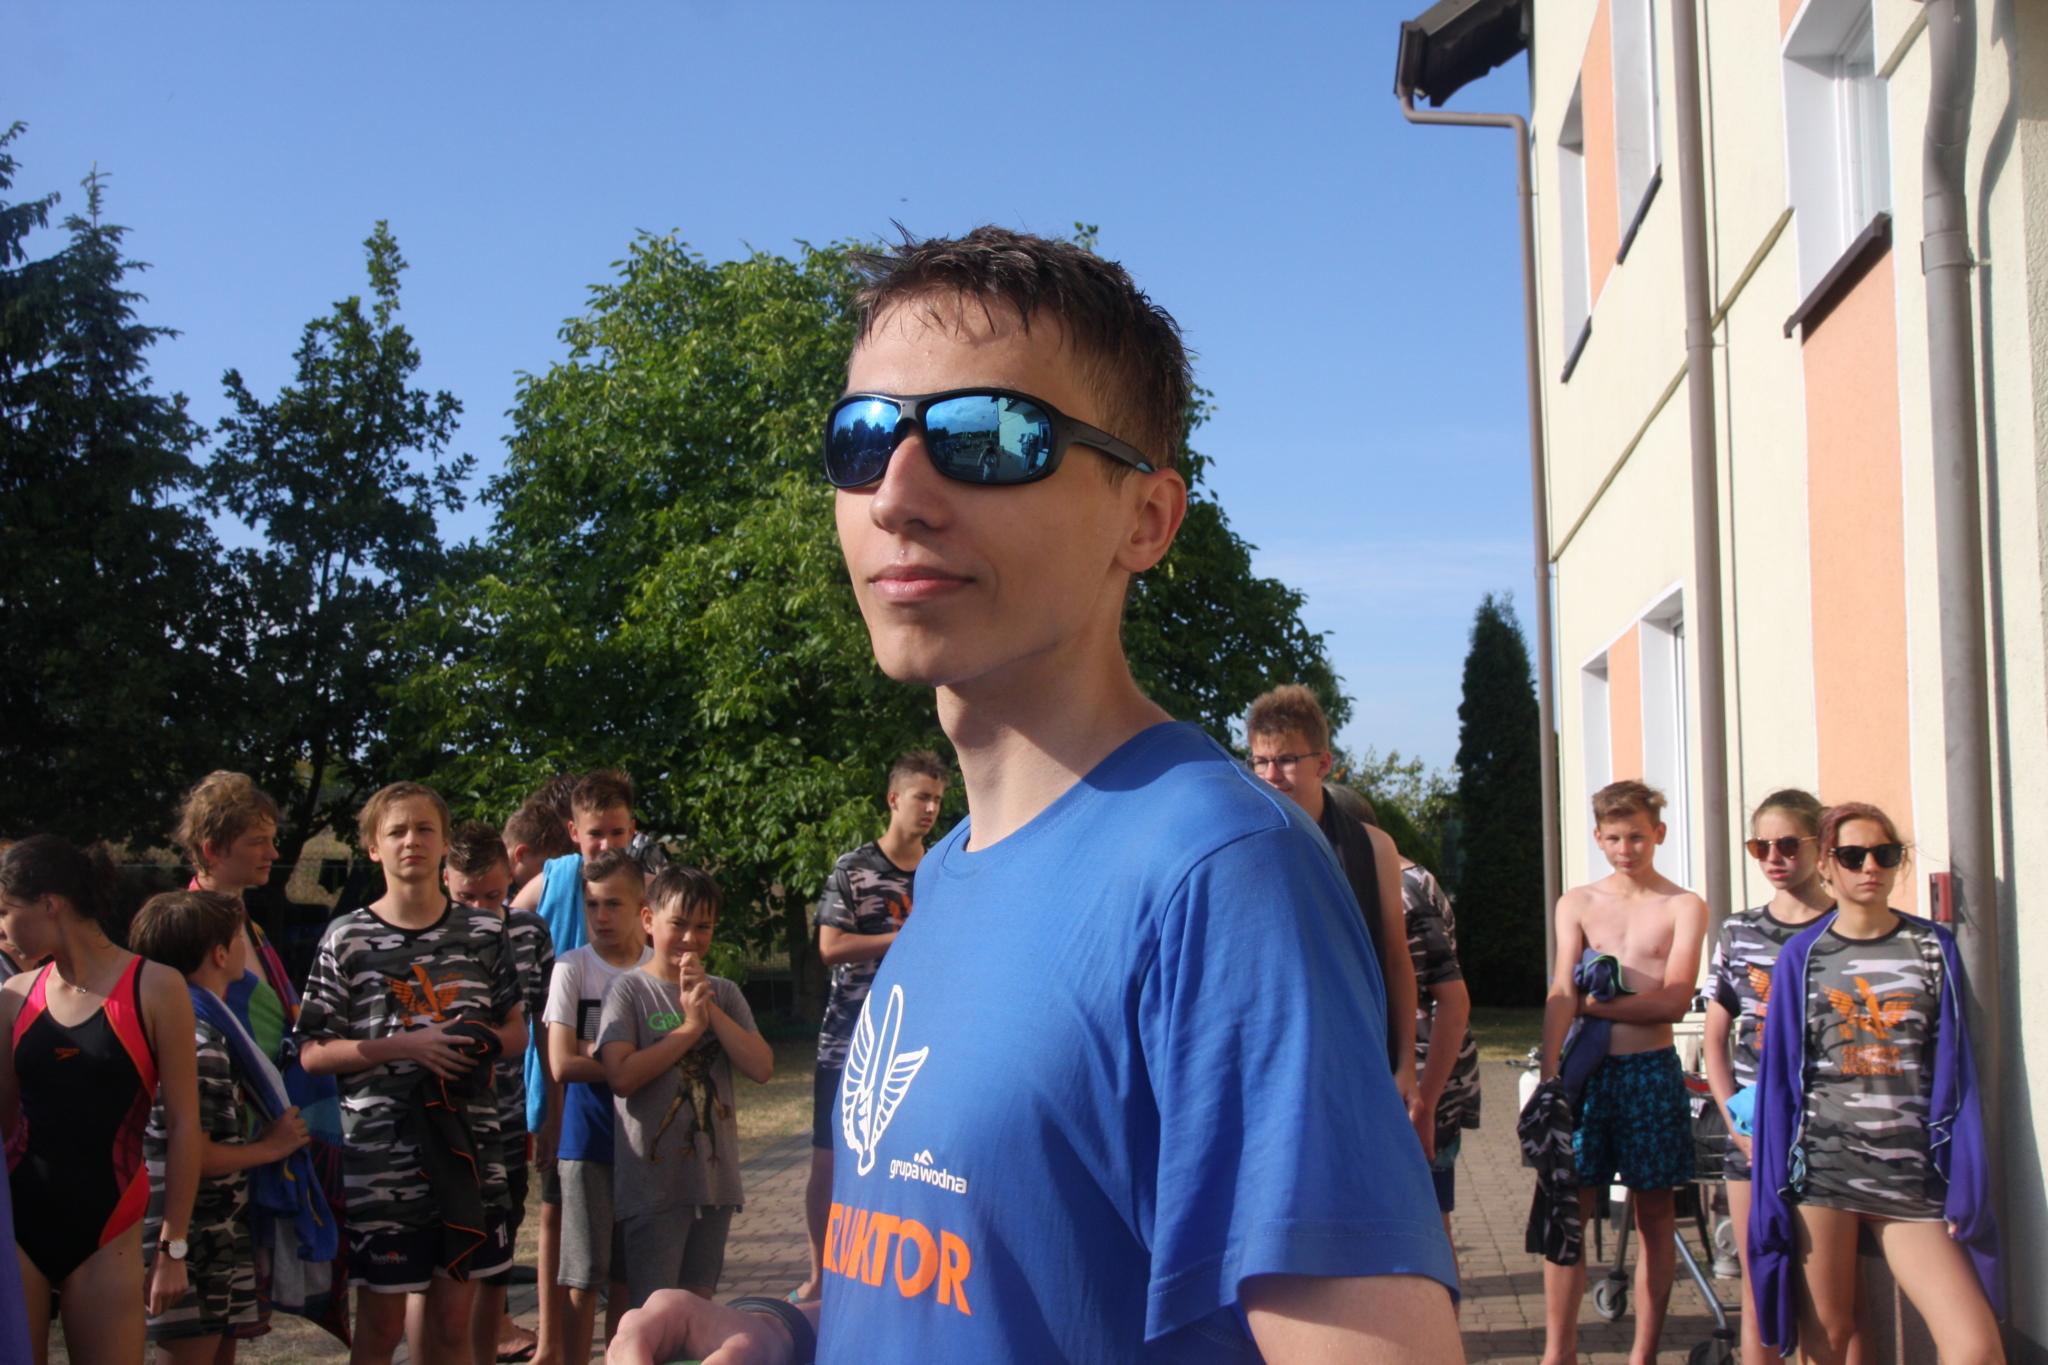 Krzysztof Sajko